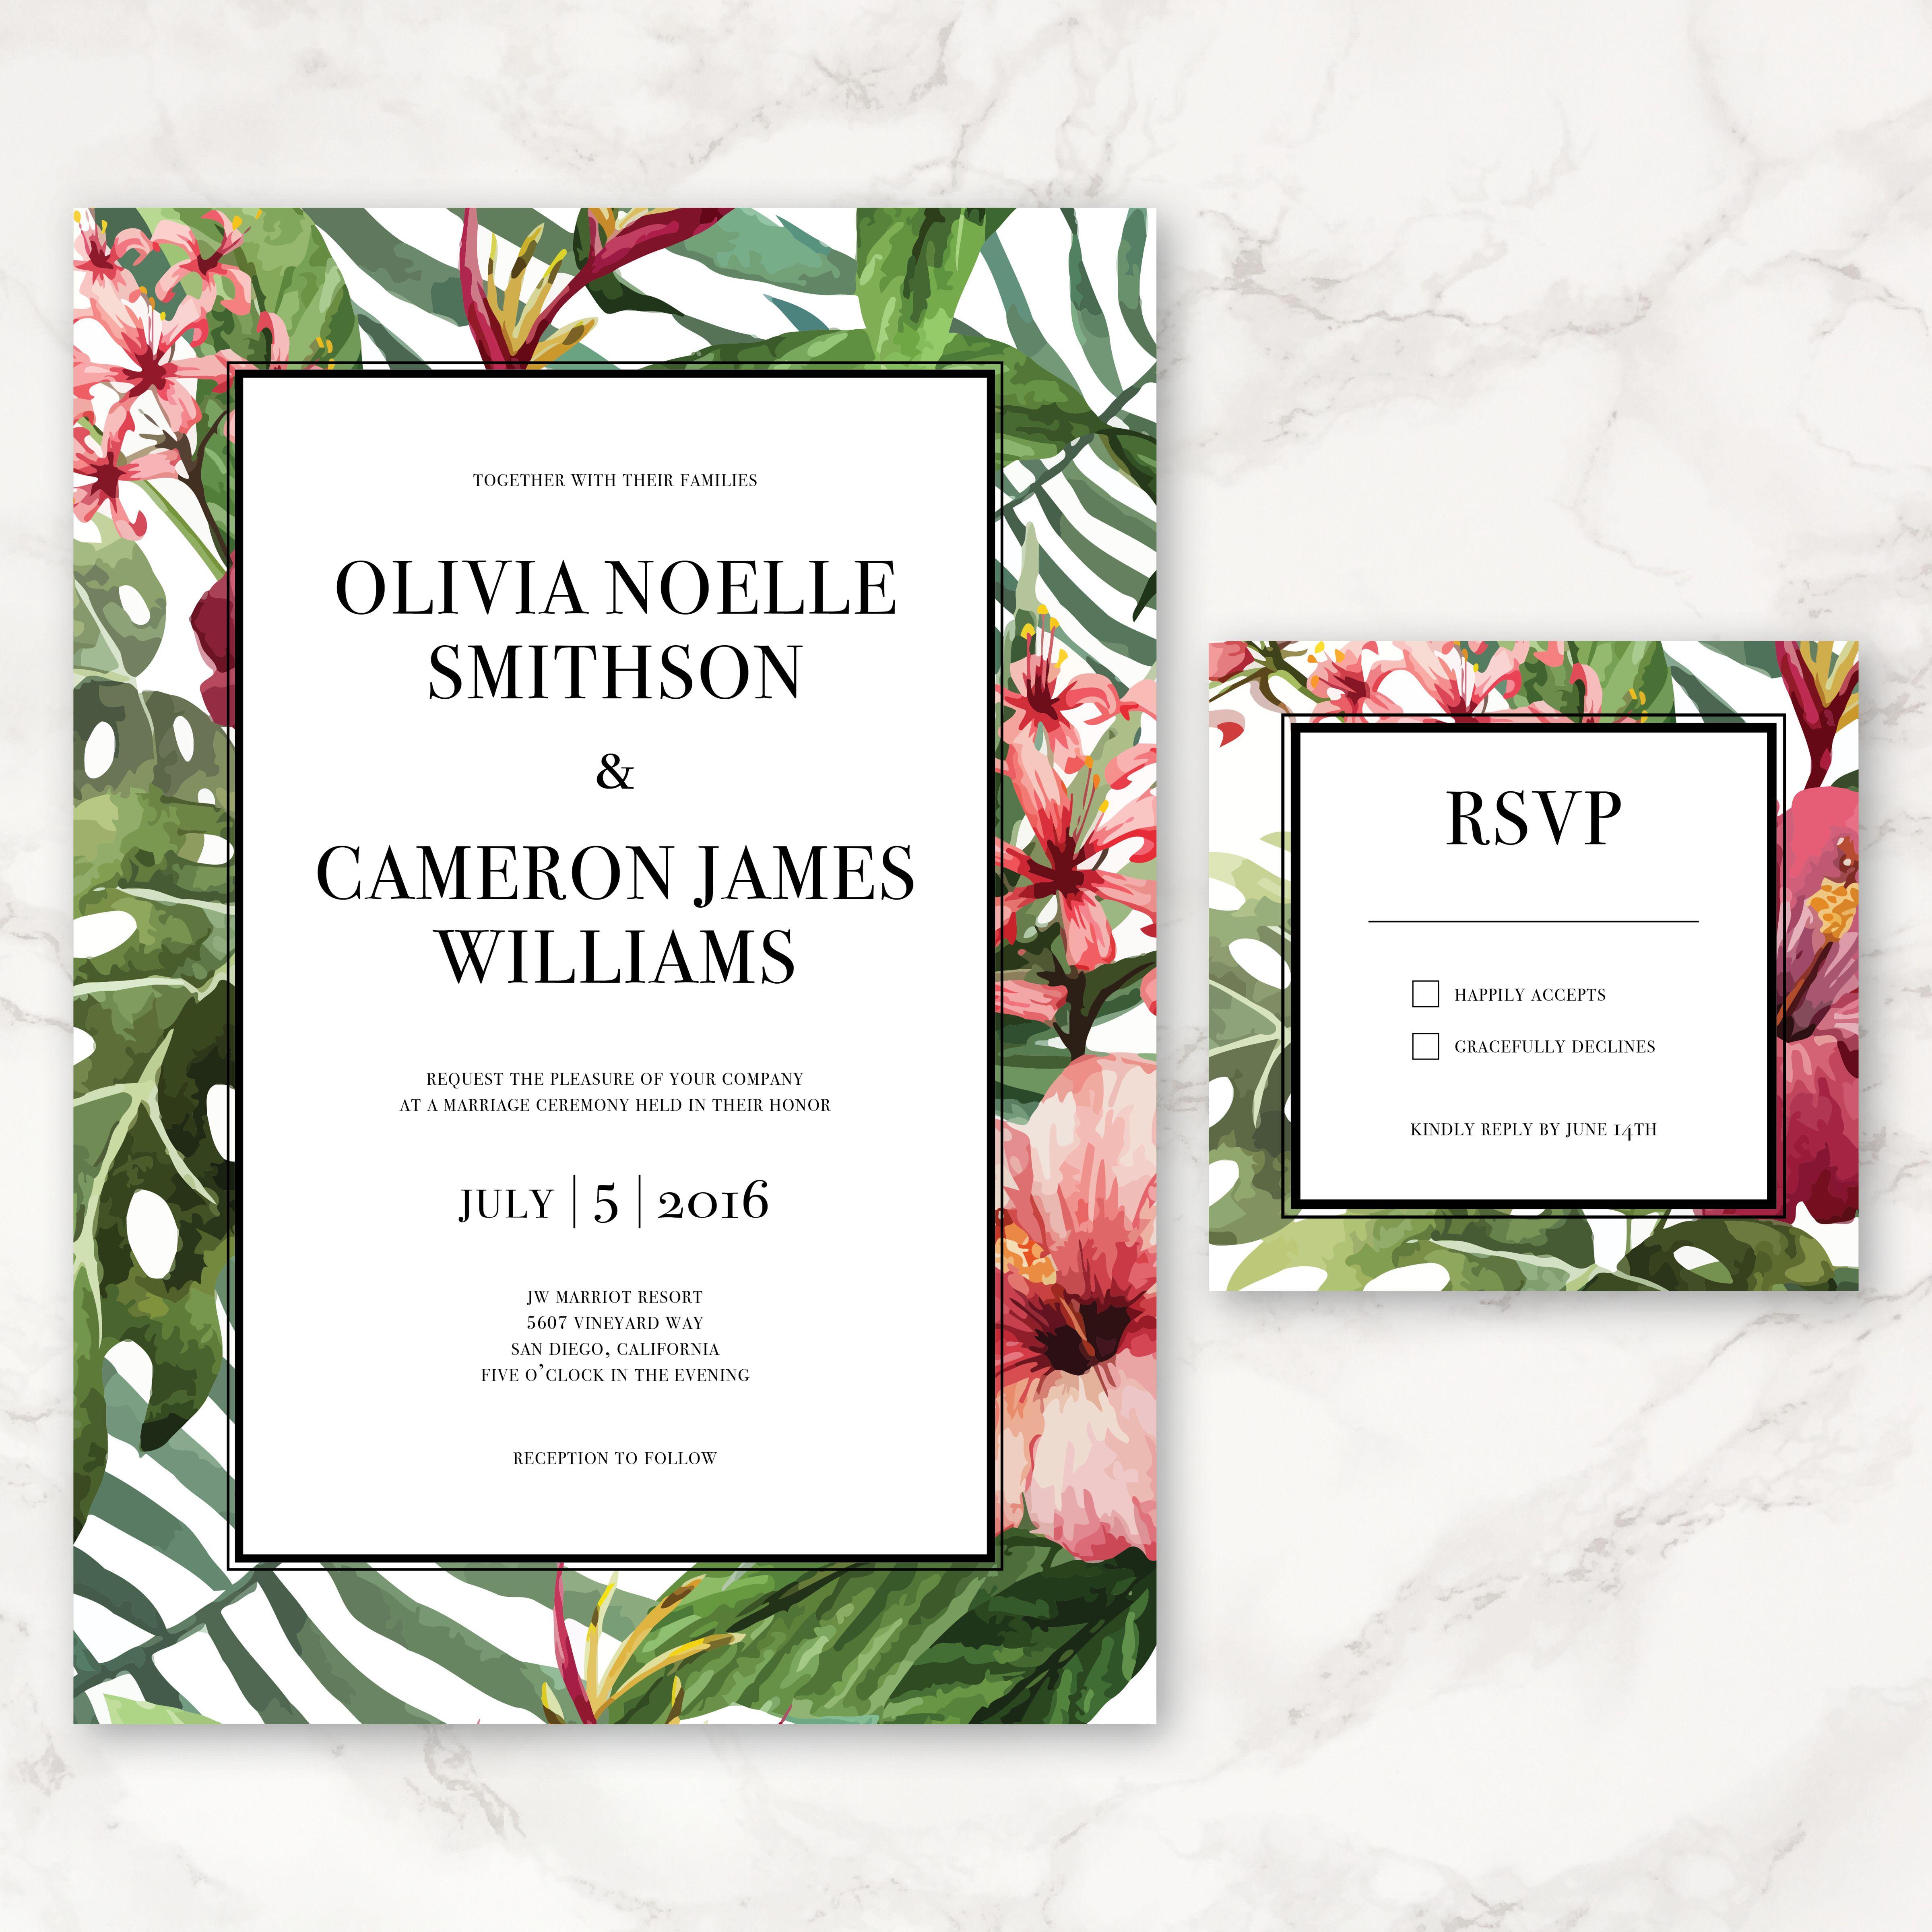 Printable Wedding Invitation - Watercolor Tropical Flowers - DIY ...